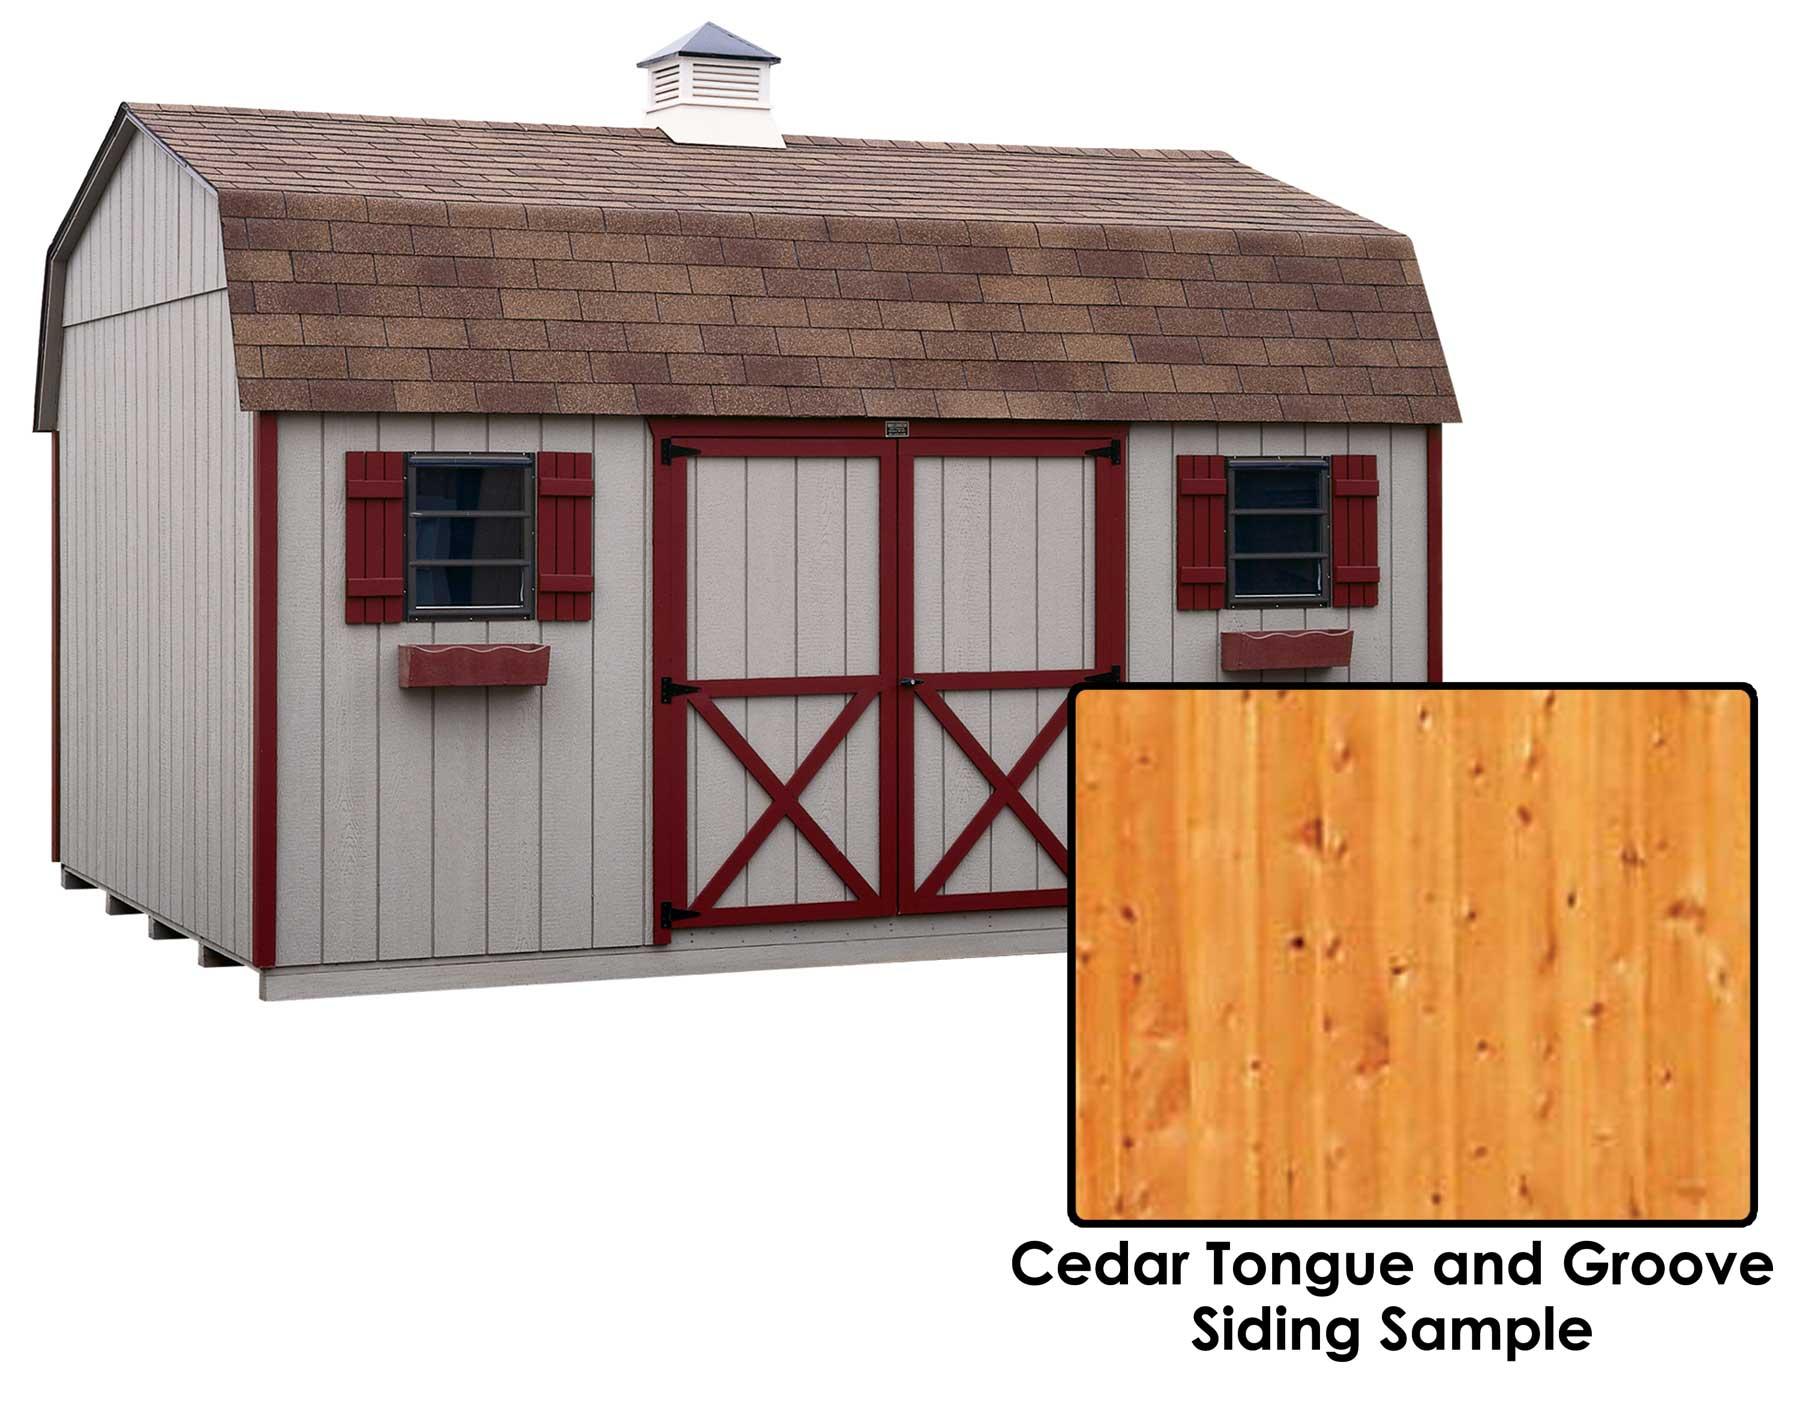 Cedar Tongue Groove Barn Style 6 39 Sidewall Sheds Sheds By Siding